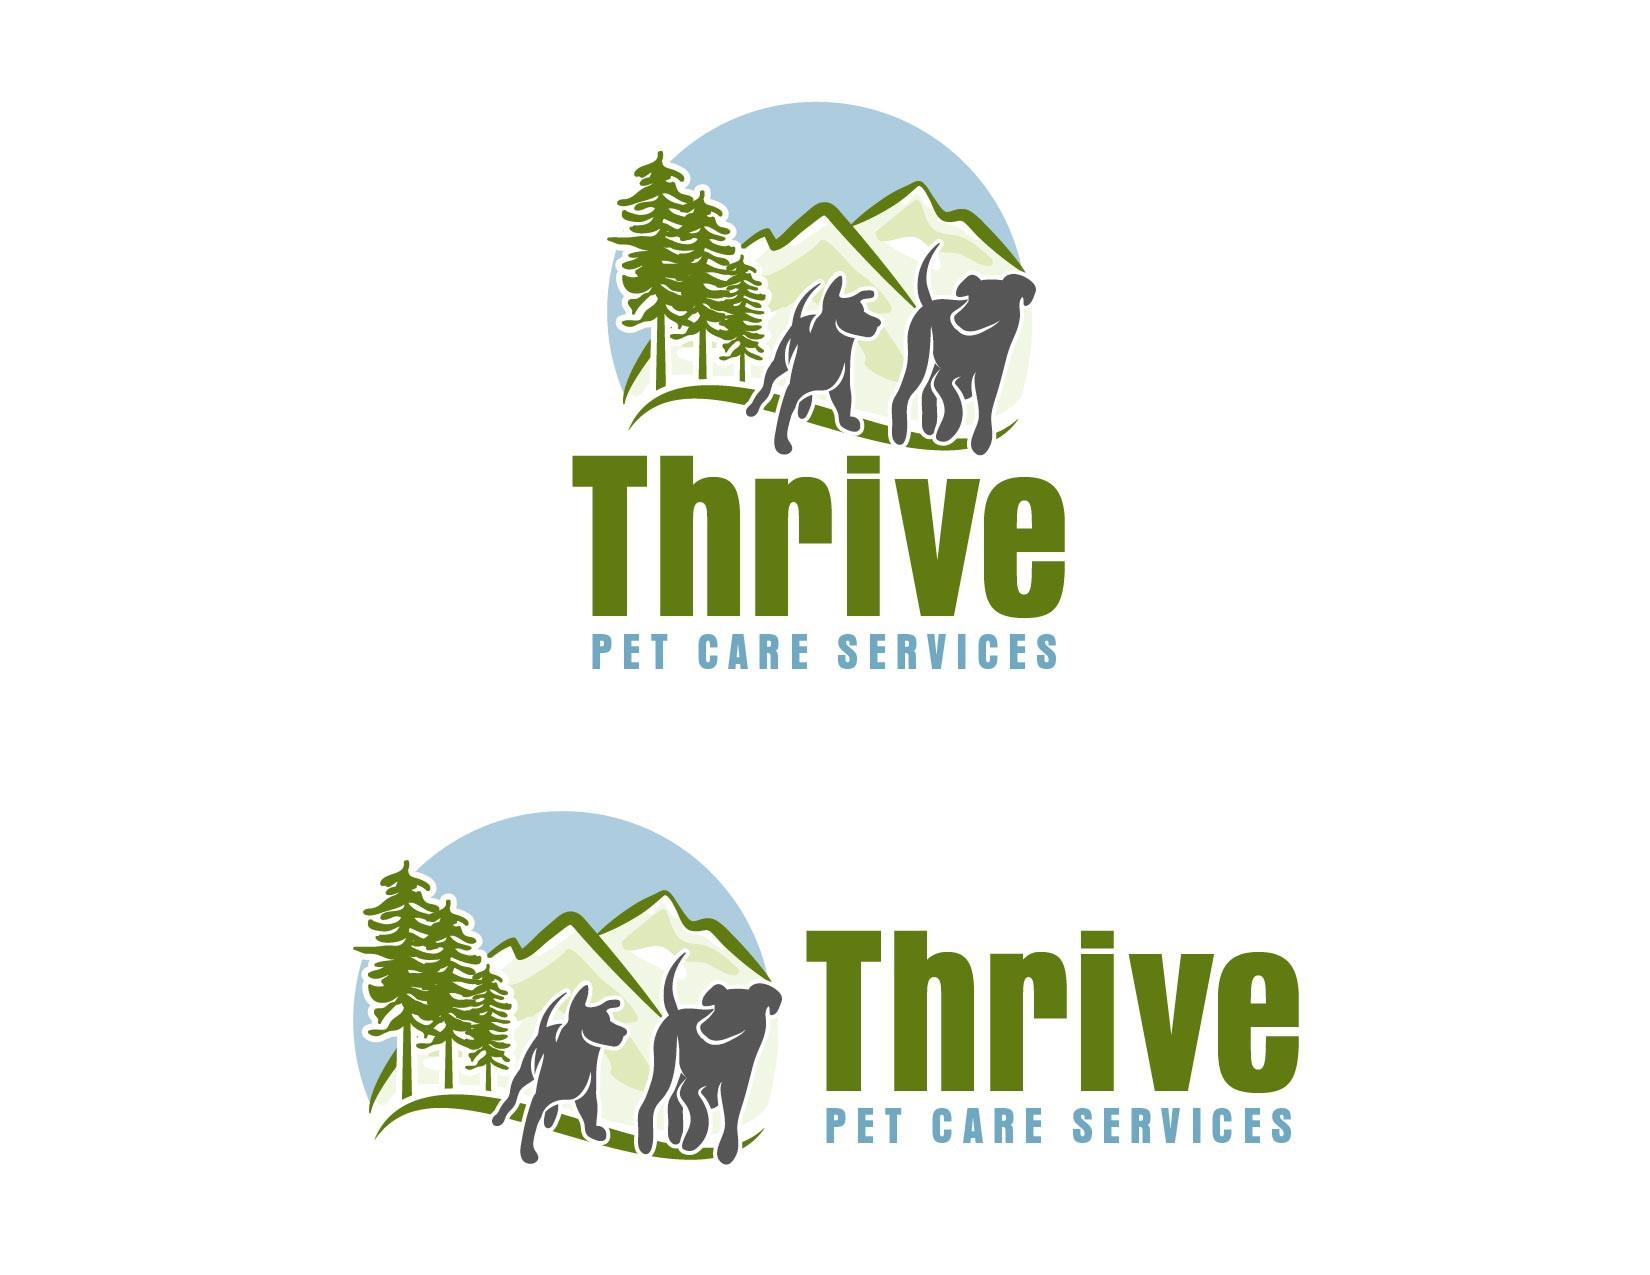 Create a fun, yet classy, logo for a pet care company in the Santa Cruz Mountains, CA.